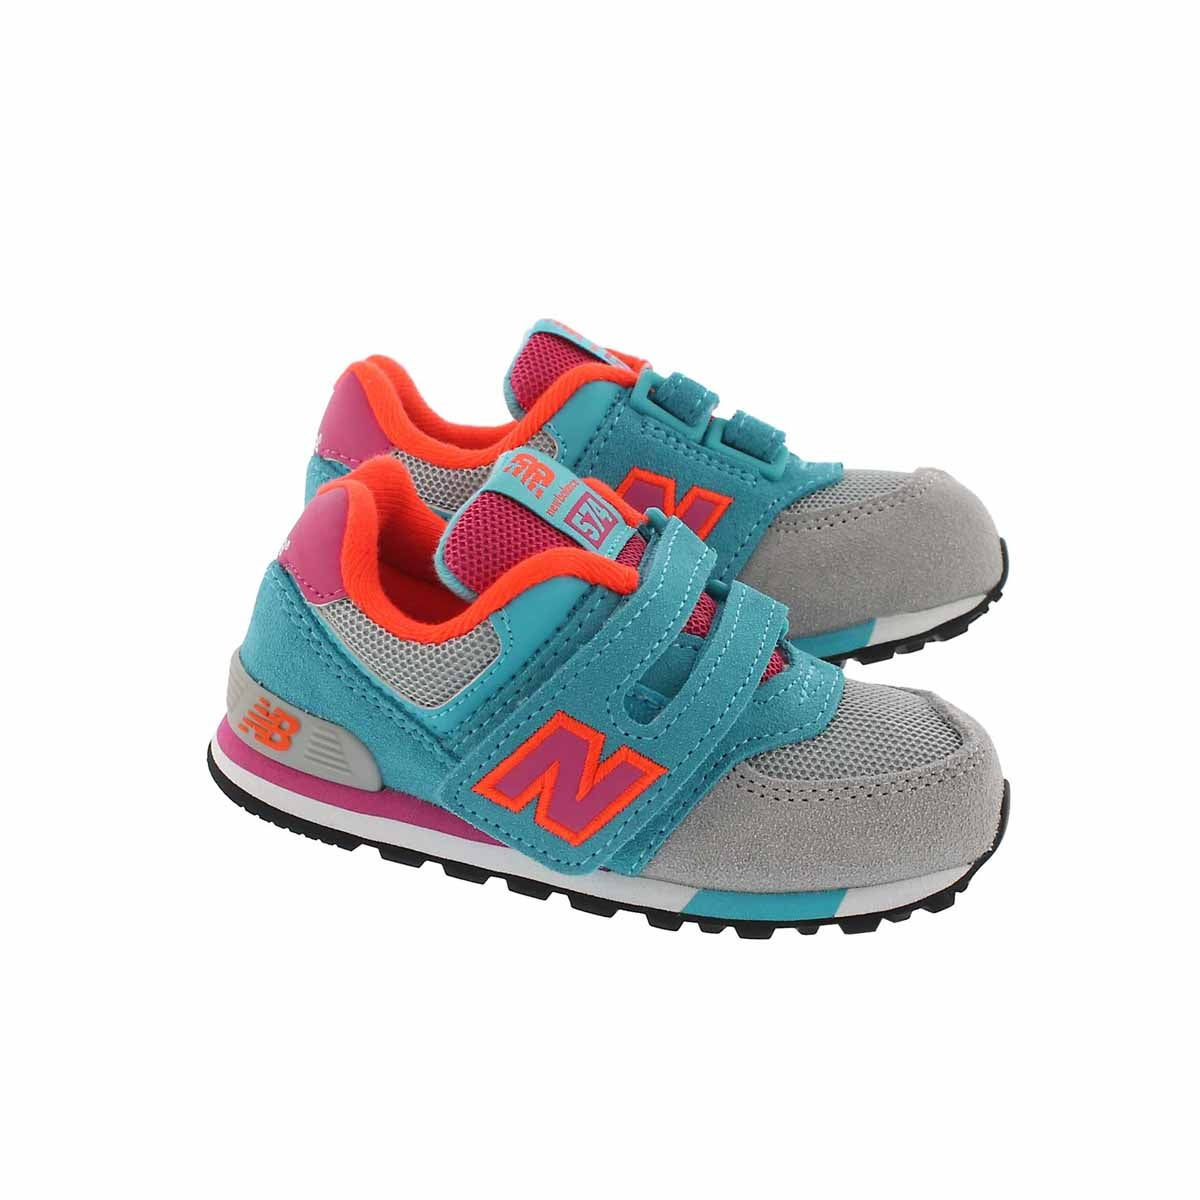 Infs-g 574 grey/teal/pink sneaker